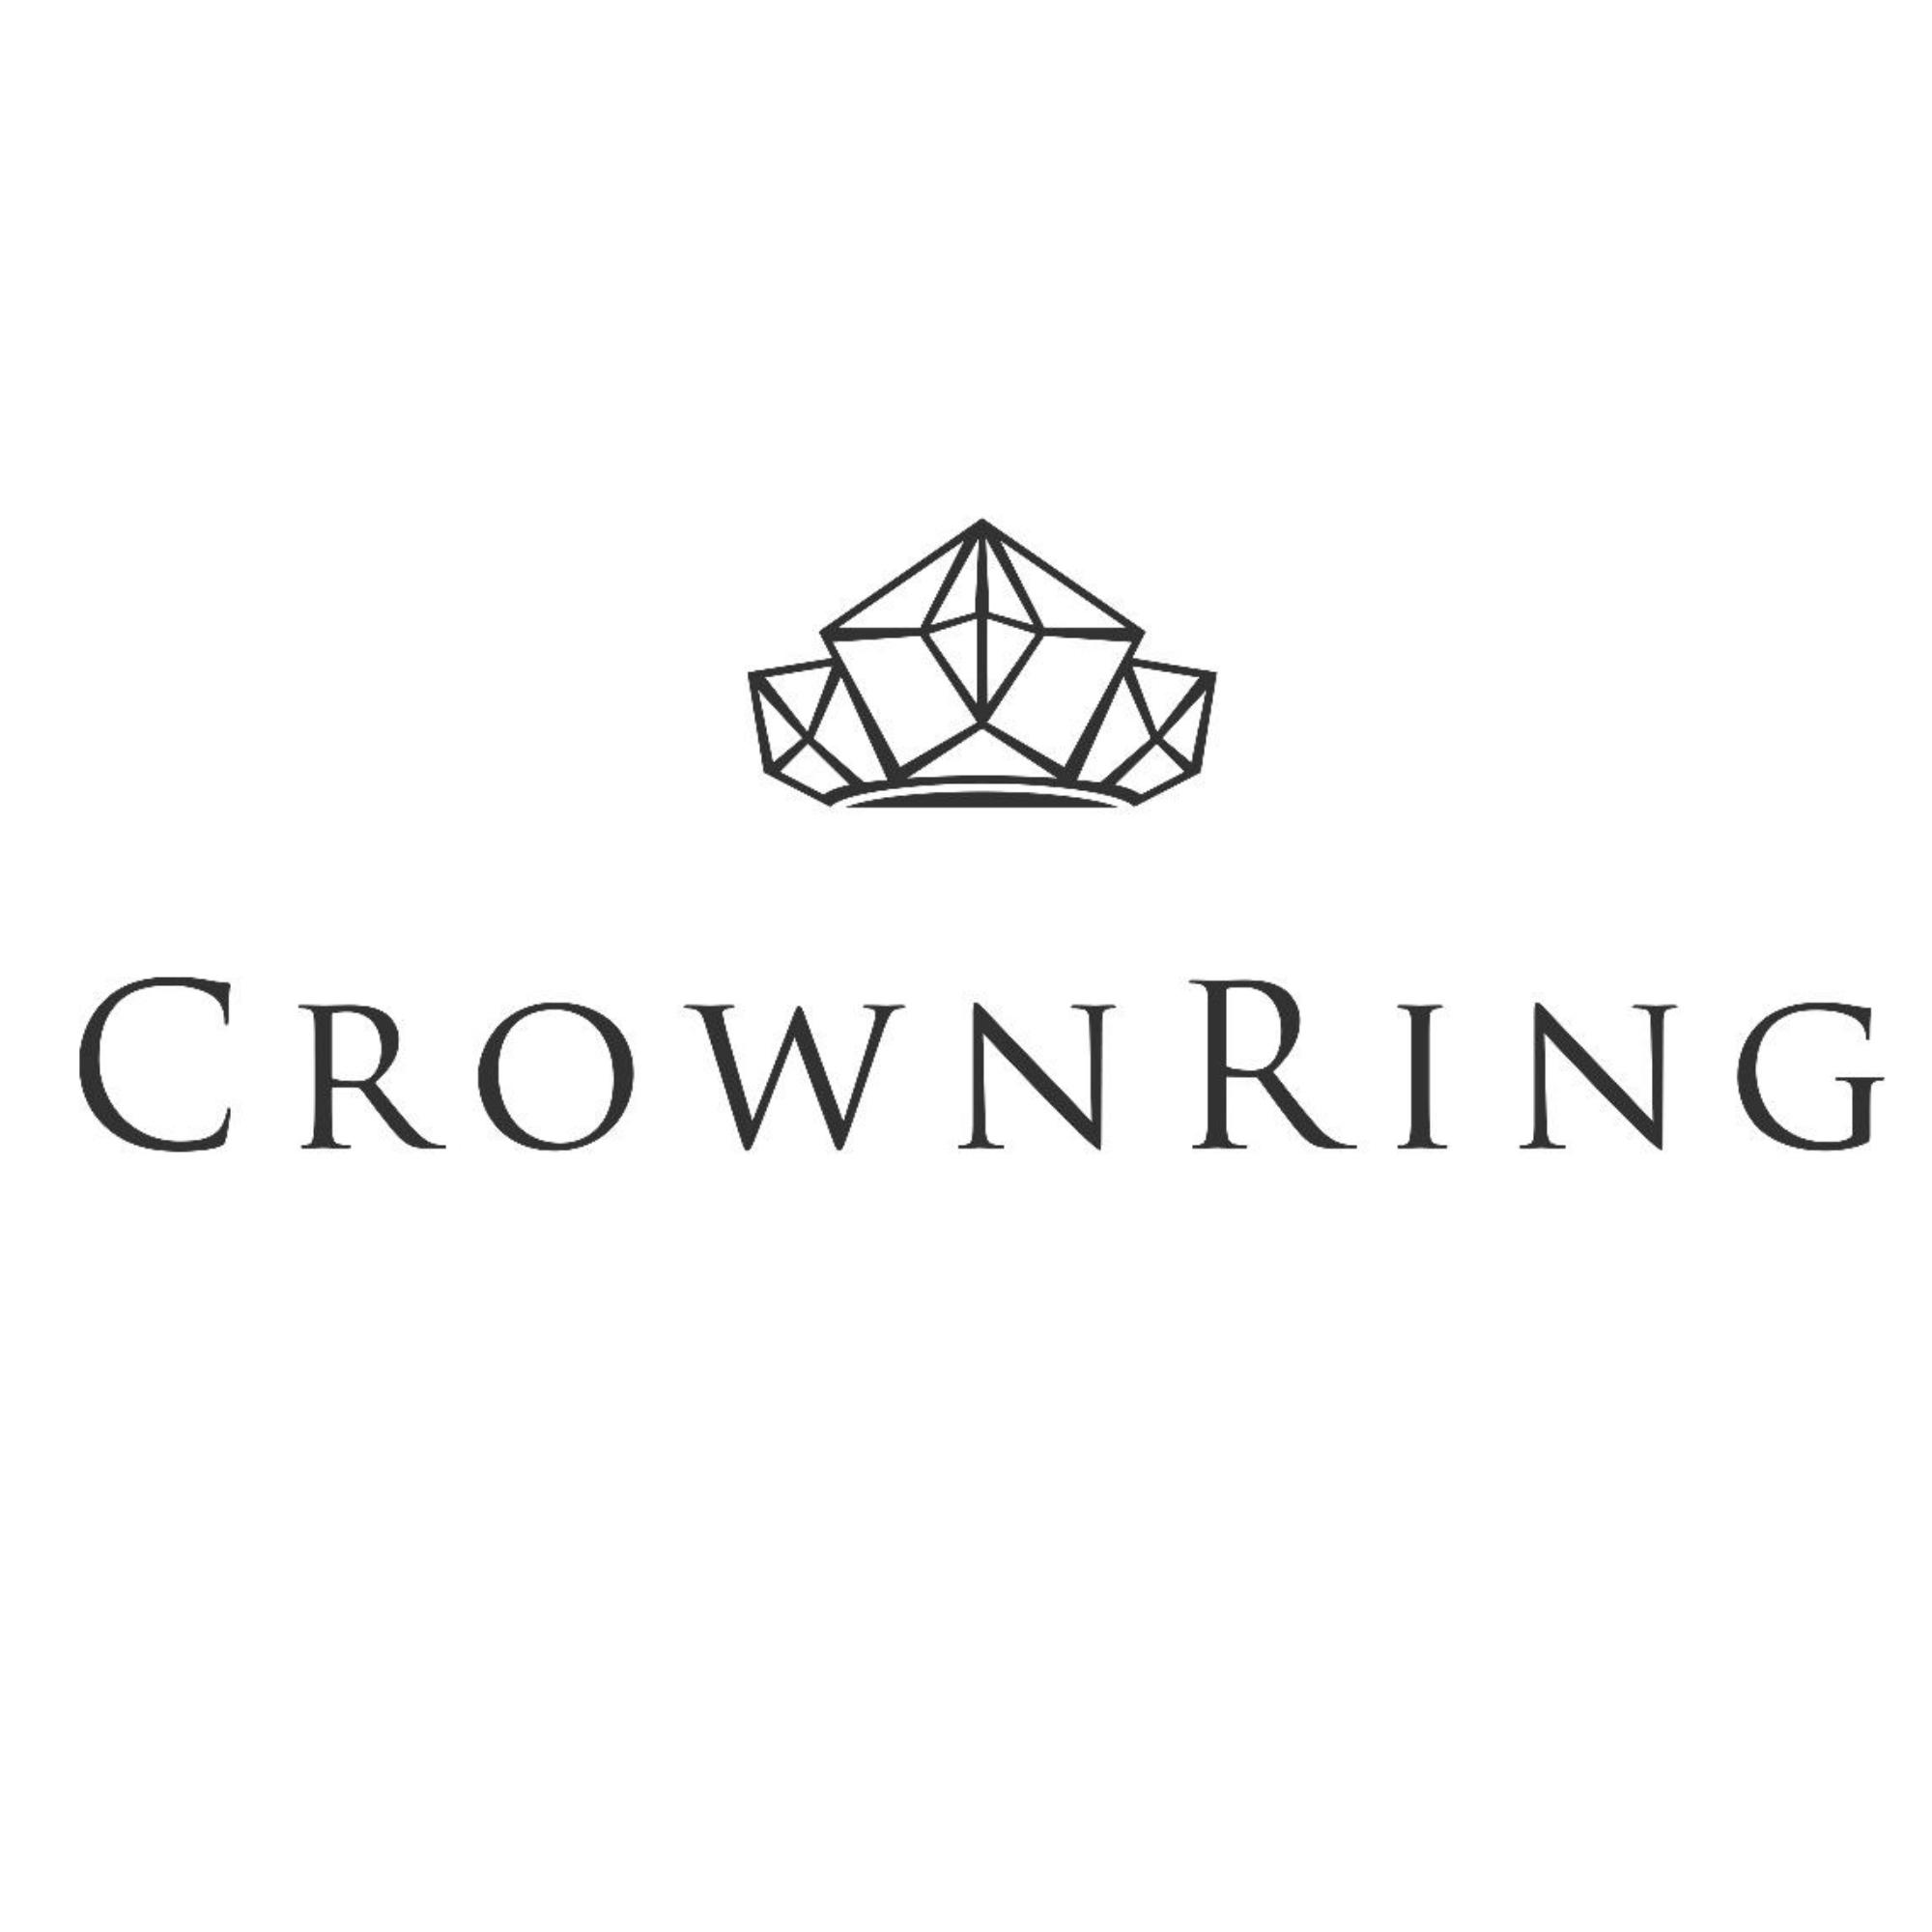 CROWNRING4ssite .jpg